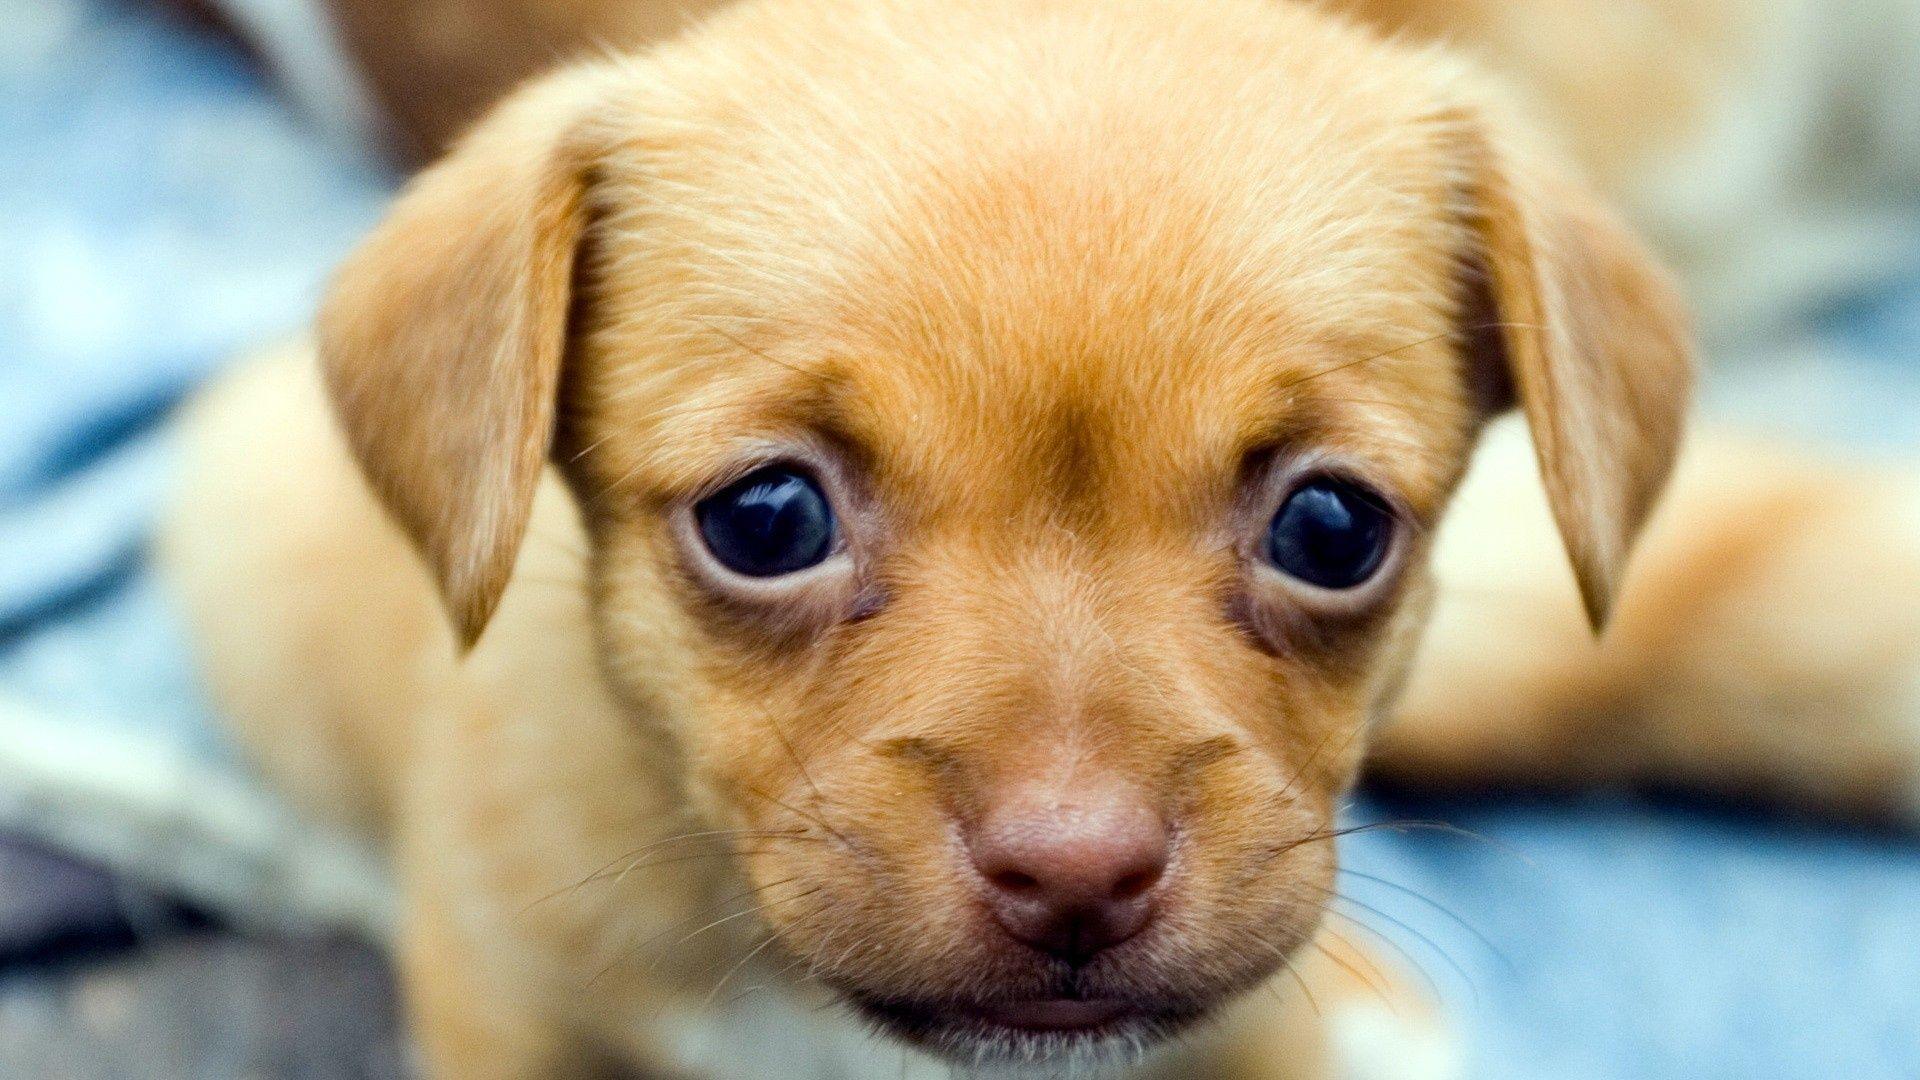 Sweetest little puppy eyes ever cutest dogs naturessleep